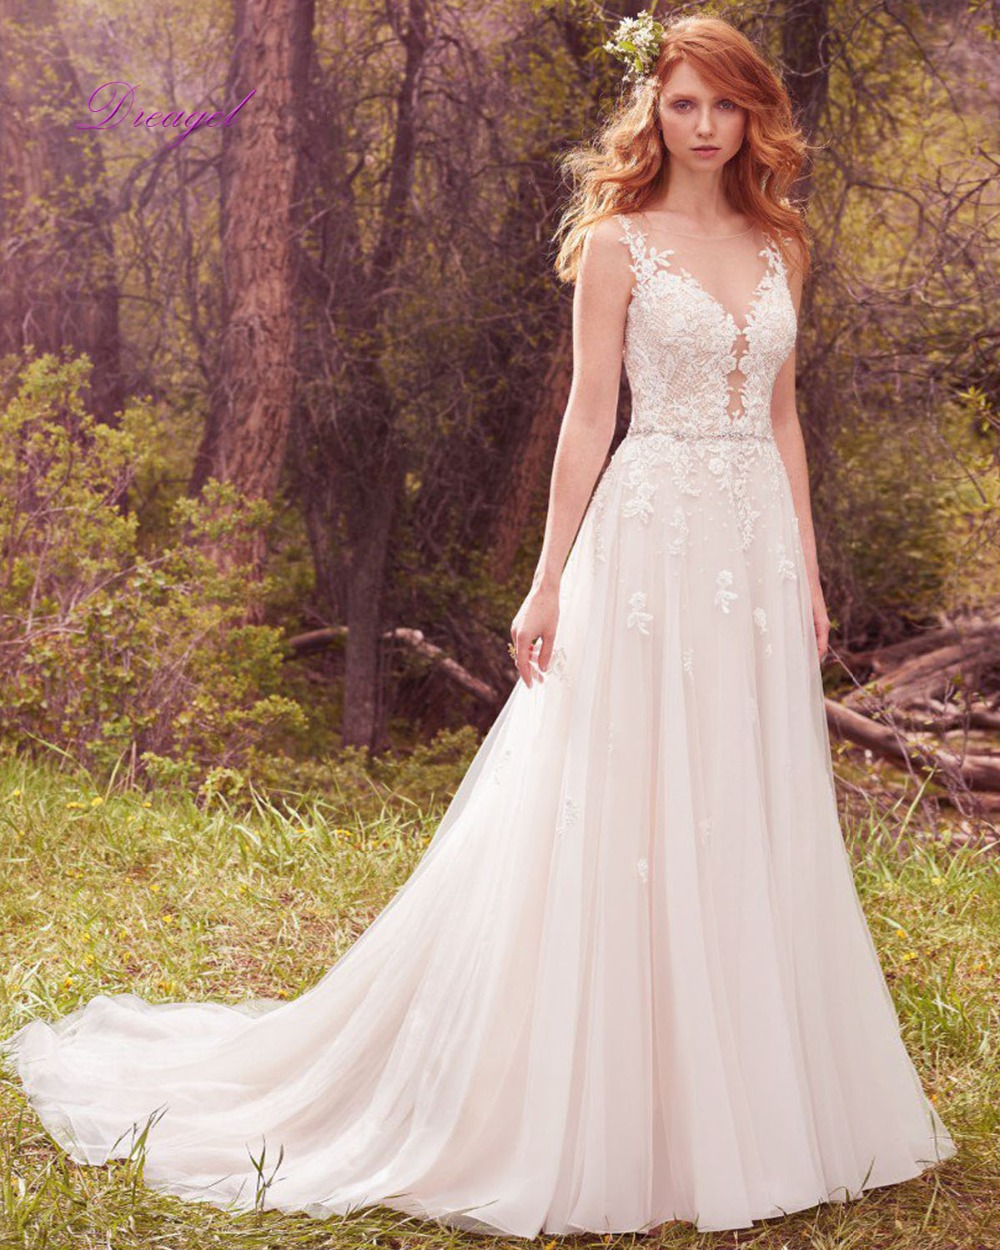 lace plunge wedding dress plunge wedding dress Lace Plunge Wedding Dress